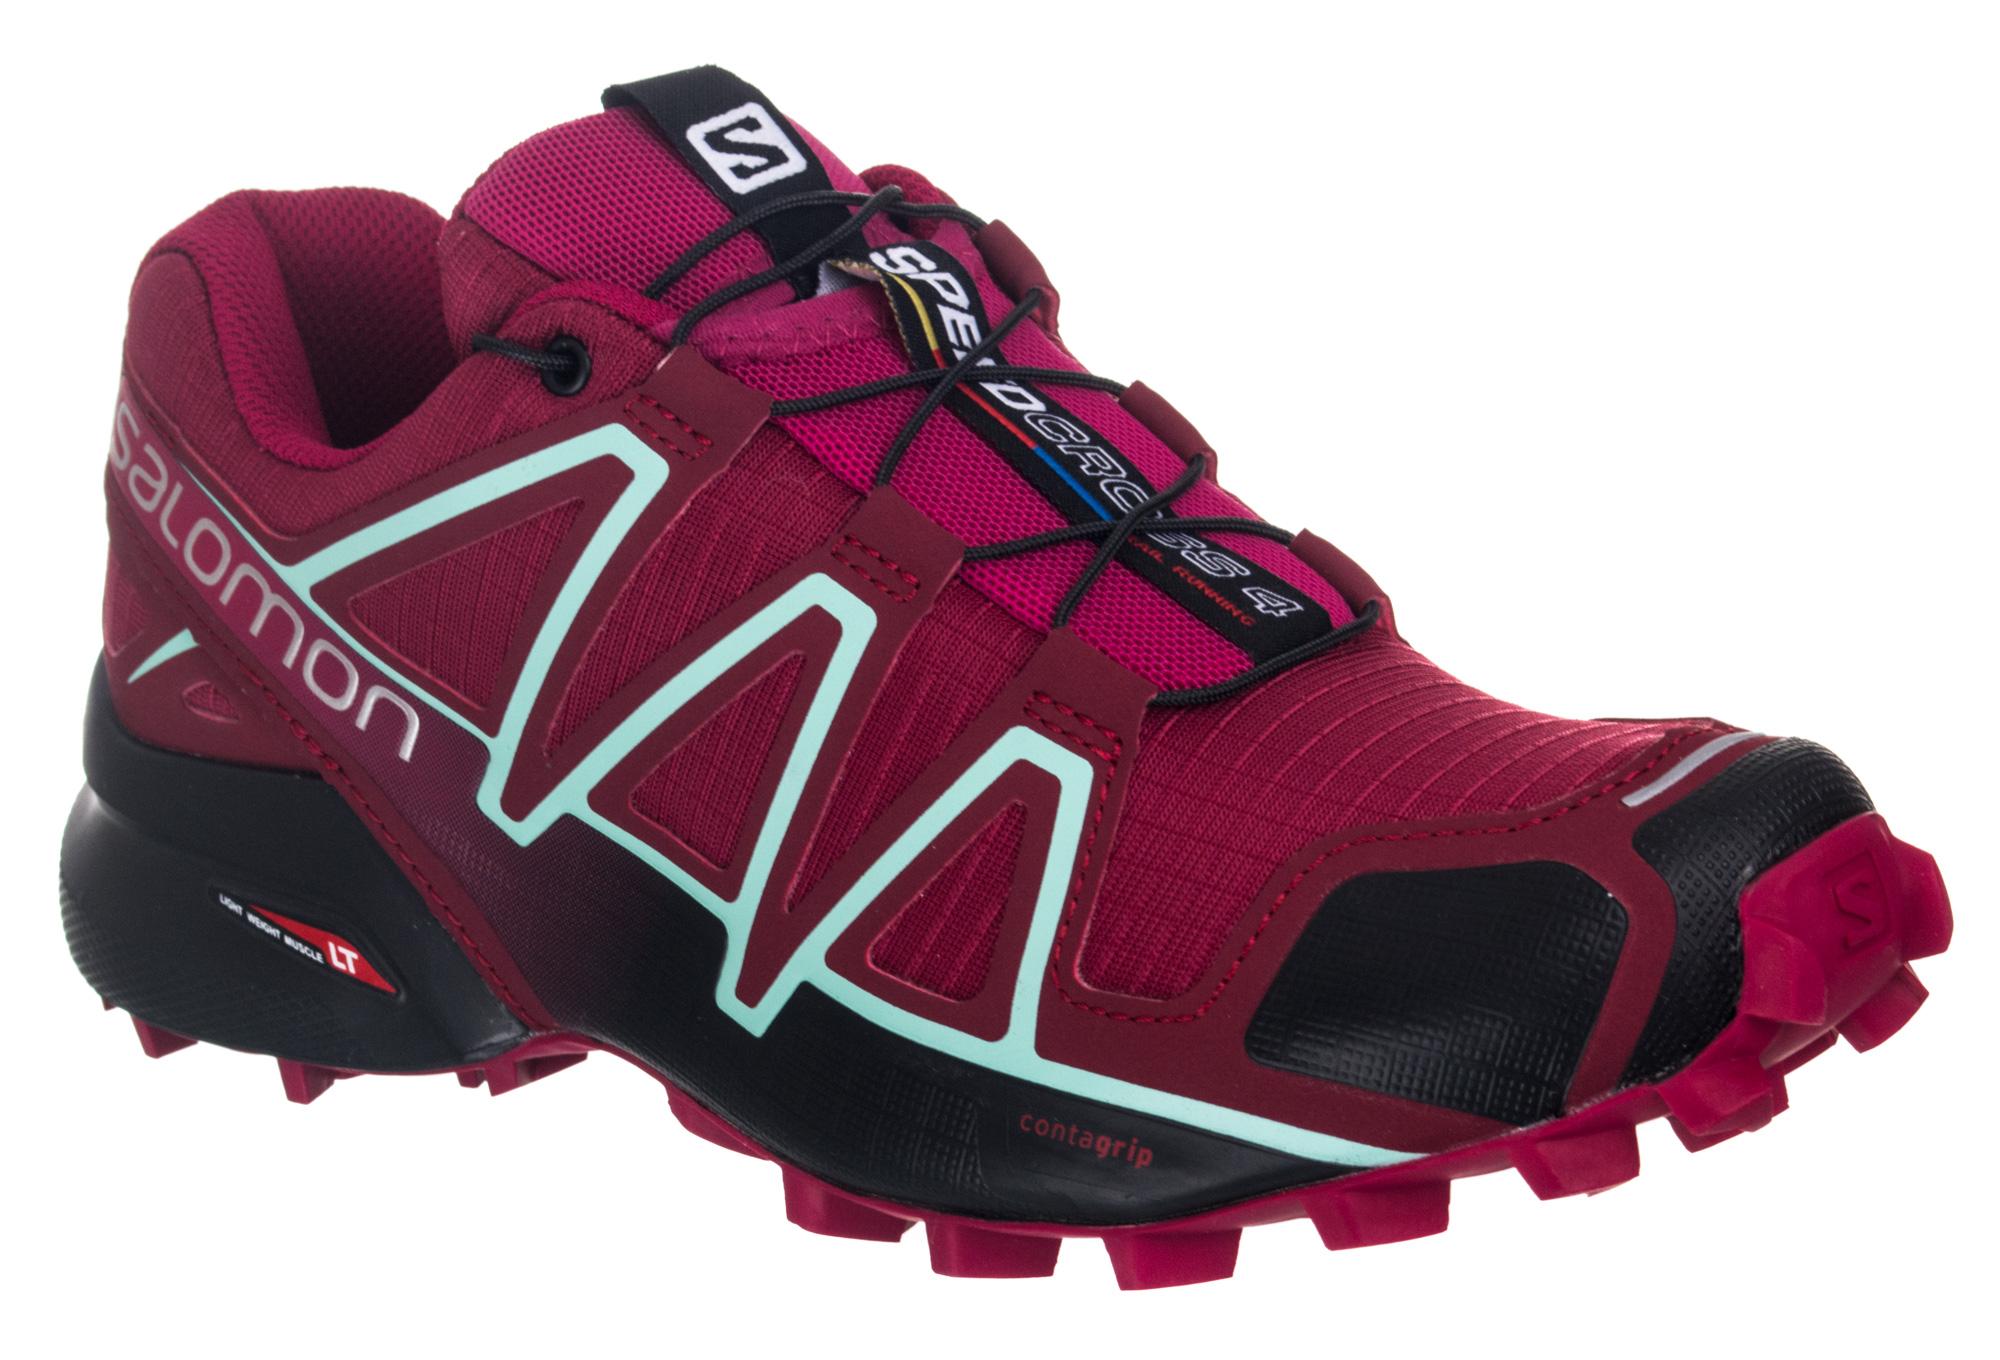 Chaussures de Trail Femme Salomon SPEEDCROSS 4 Rose